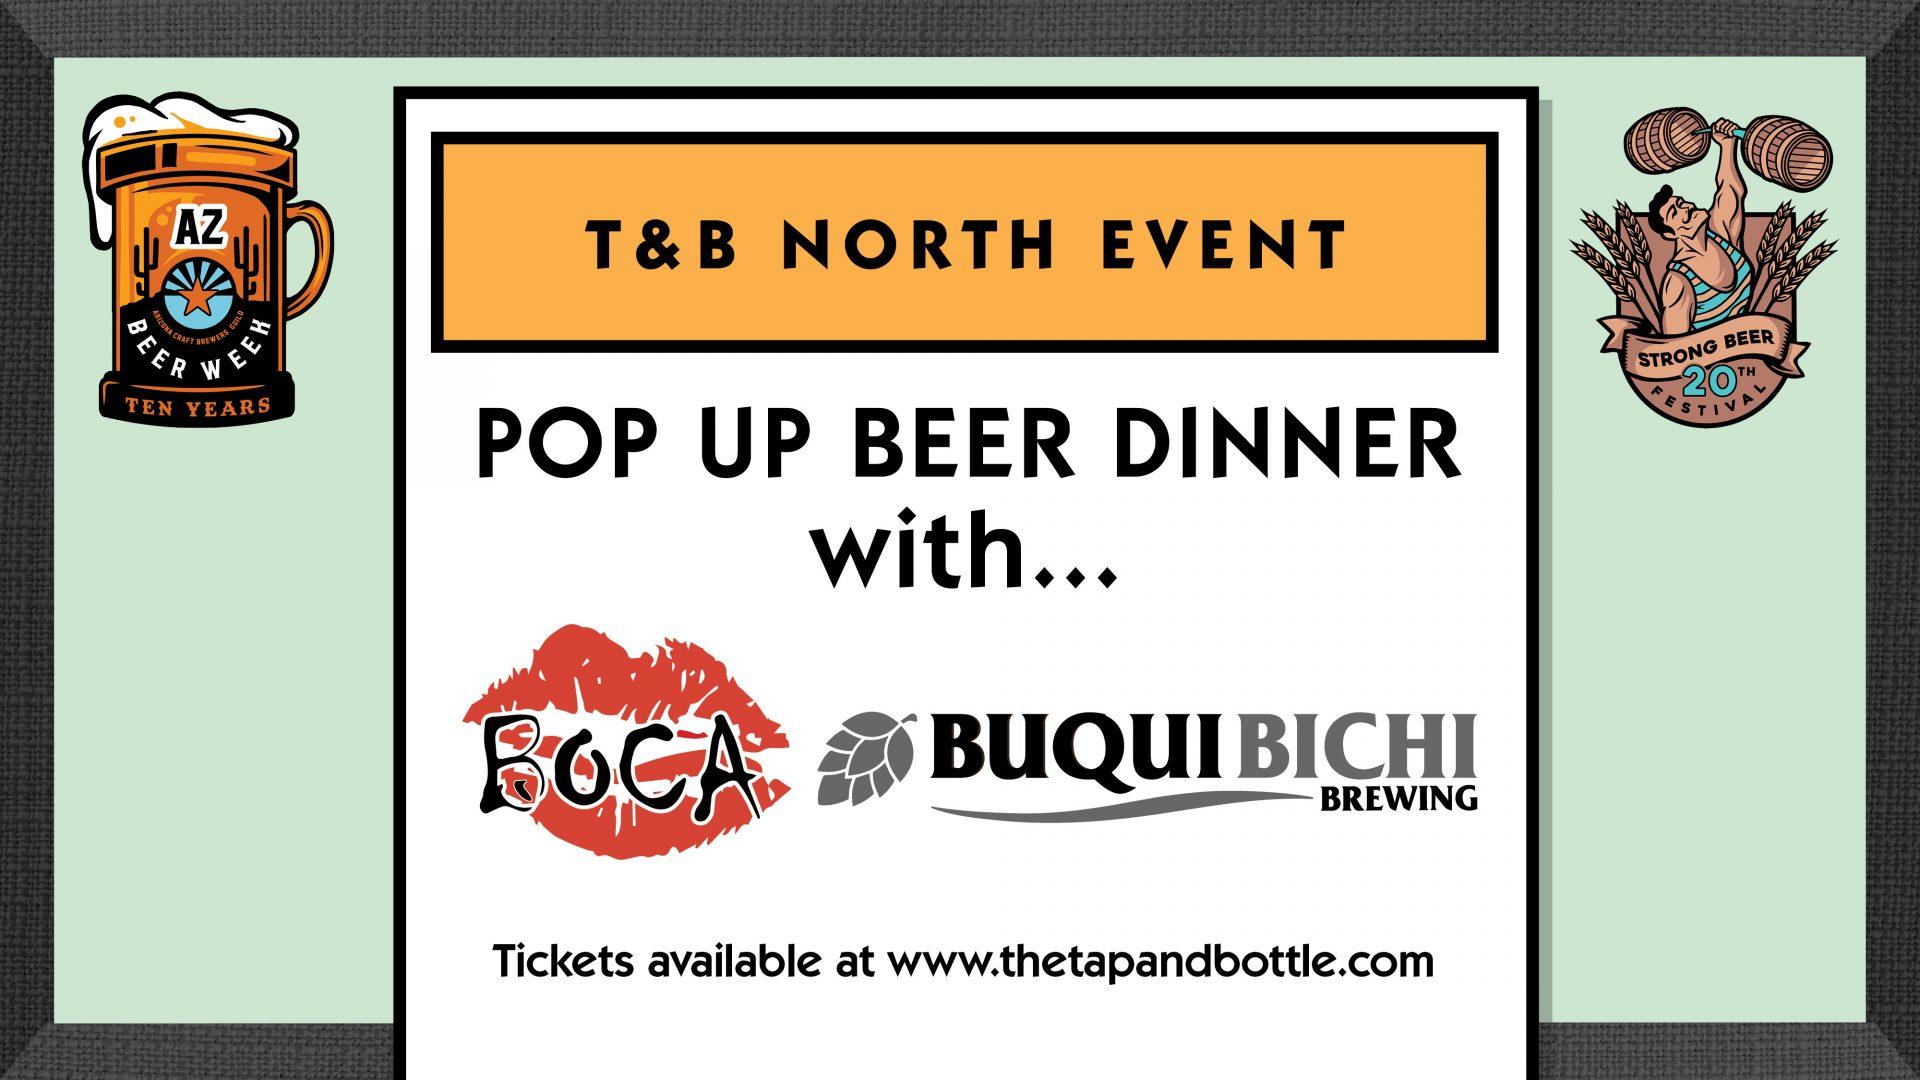 Pop-up Beer Dinner w/ Boca + Buqui Bichi at T&B North!